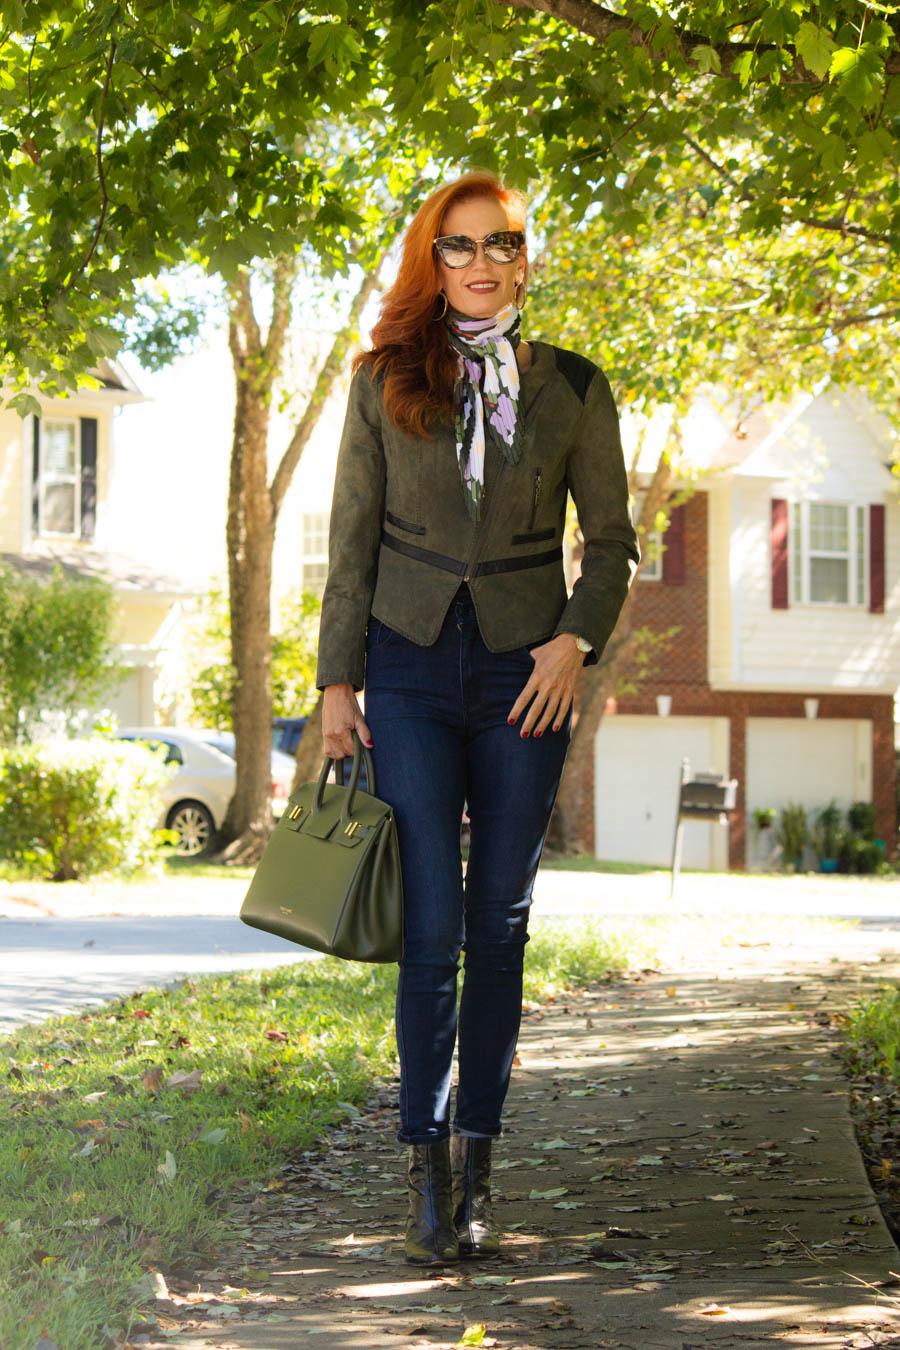 Olive moto jacket, jeans and Luxury Teddy Blake olive bag